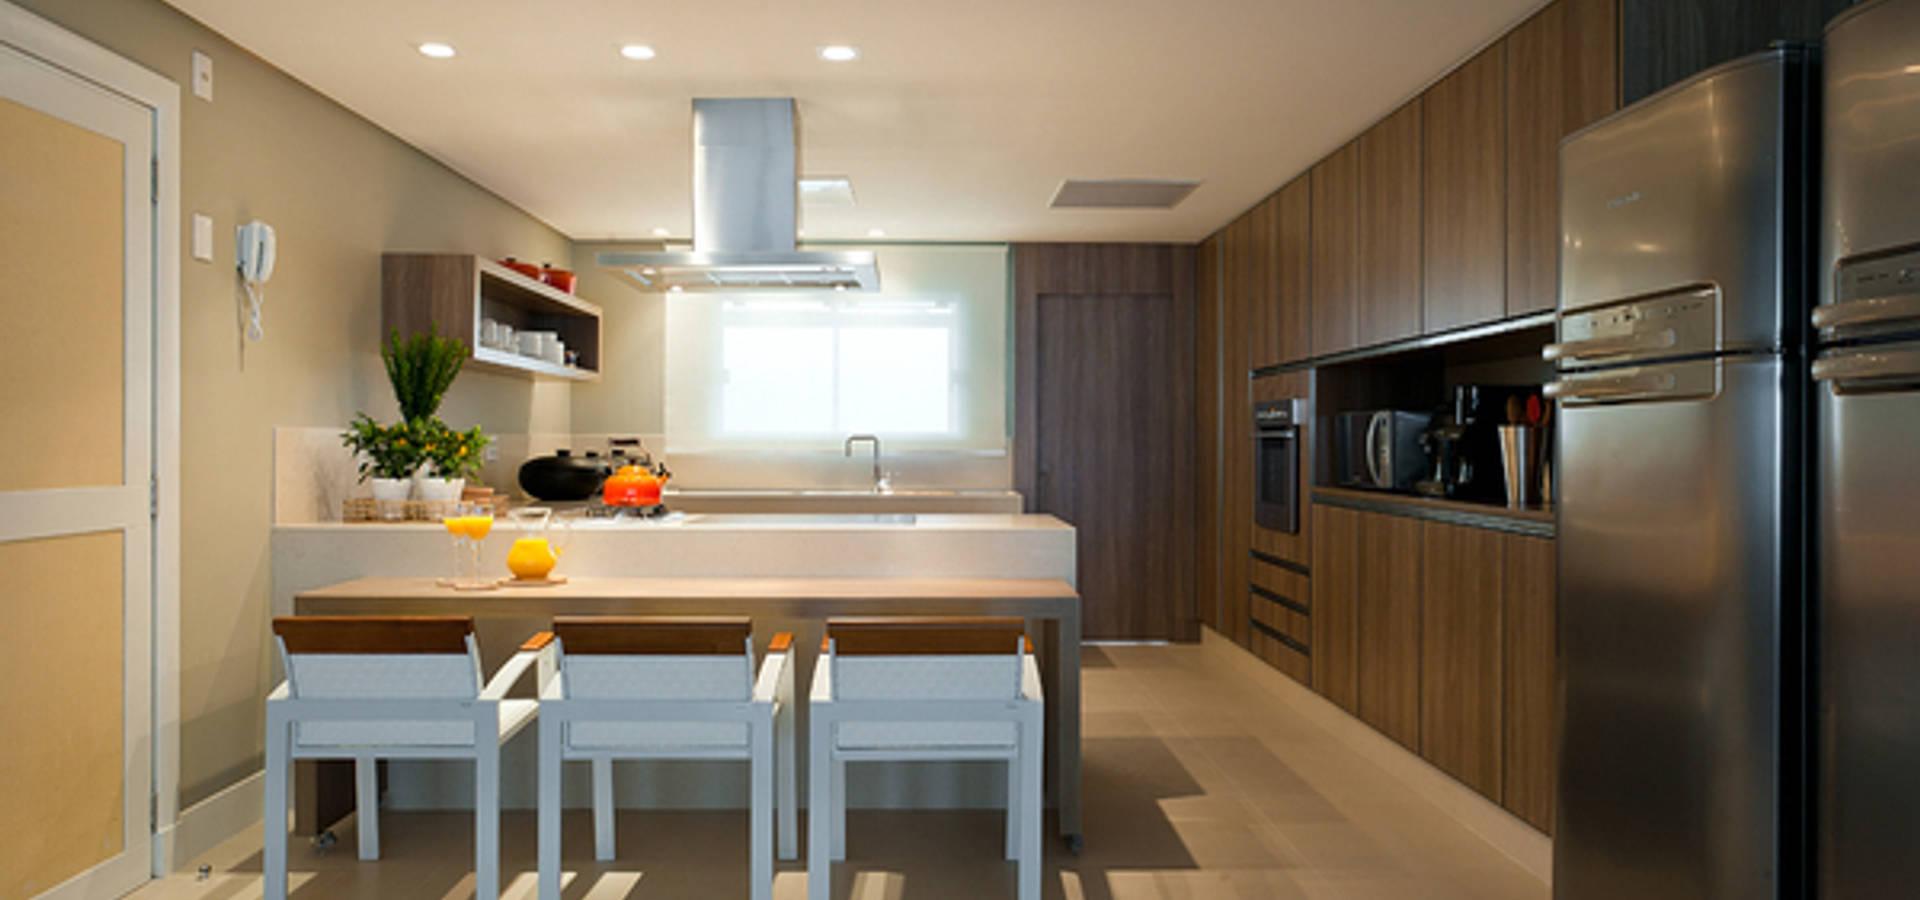 Renata Basques Arquitetura e Design de Interiores